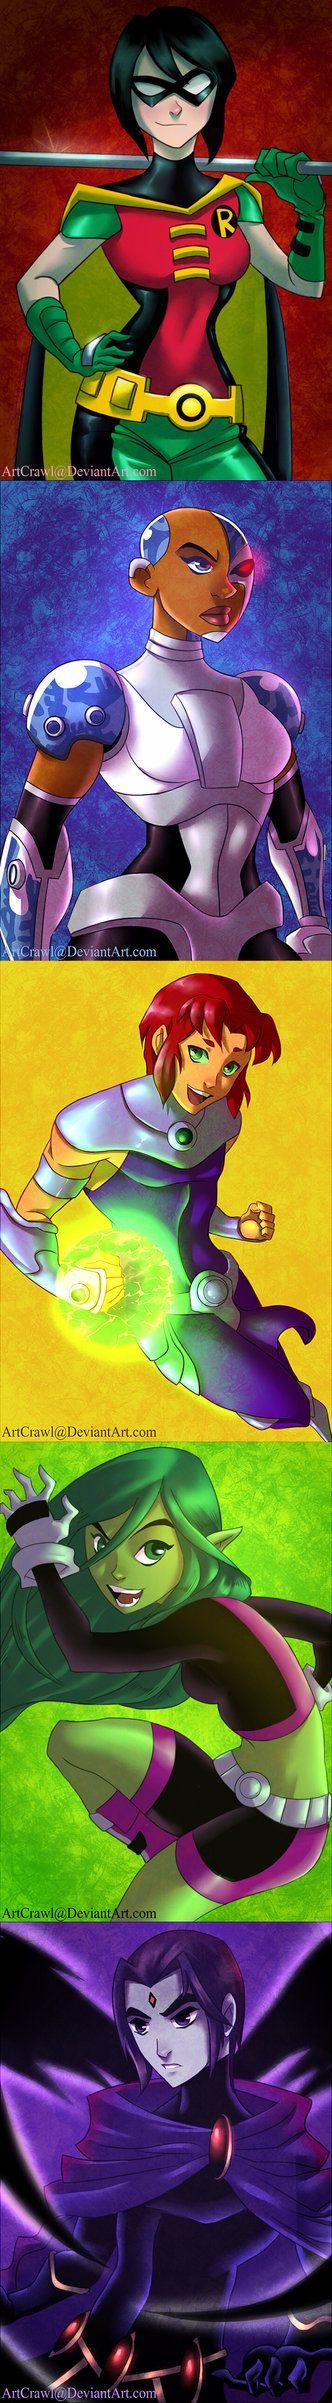 Teen Titans: Gender Bend by ArtCrawl on DeviantArt